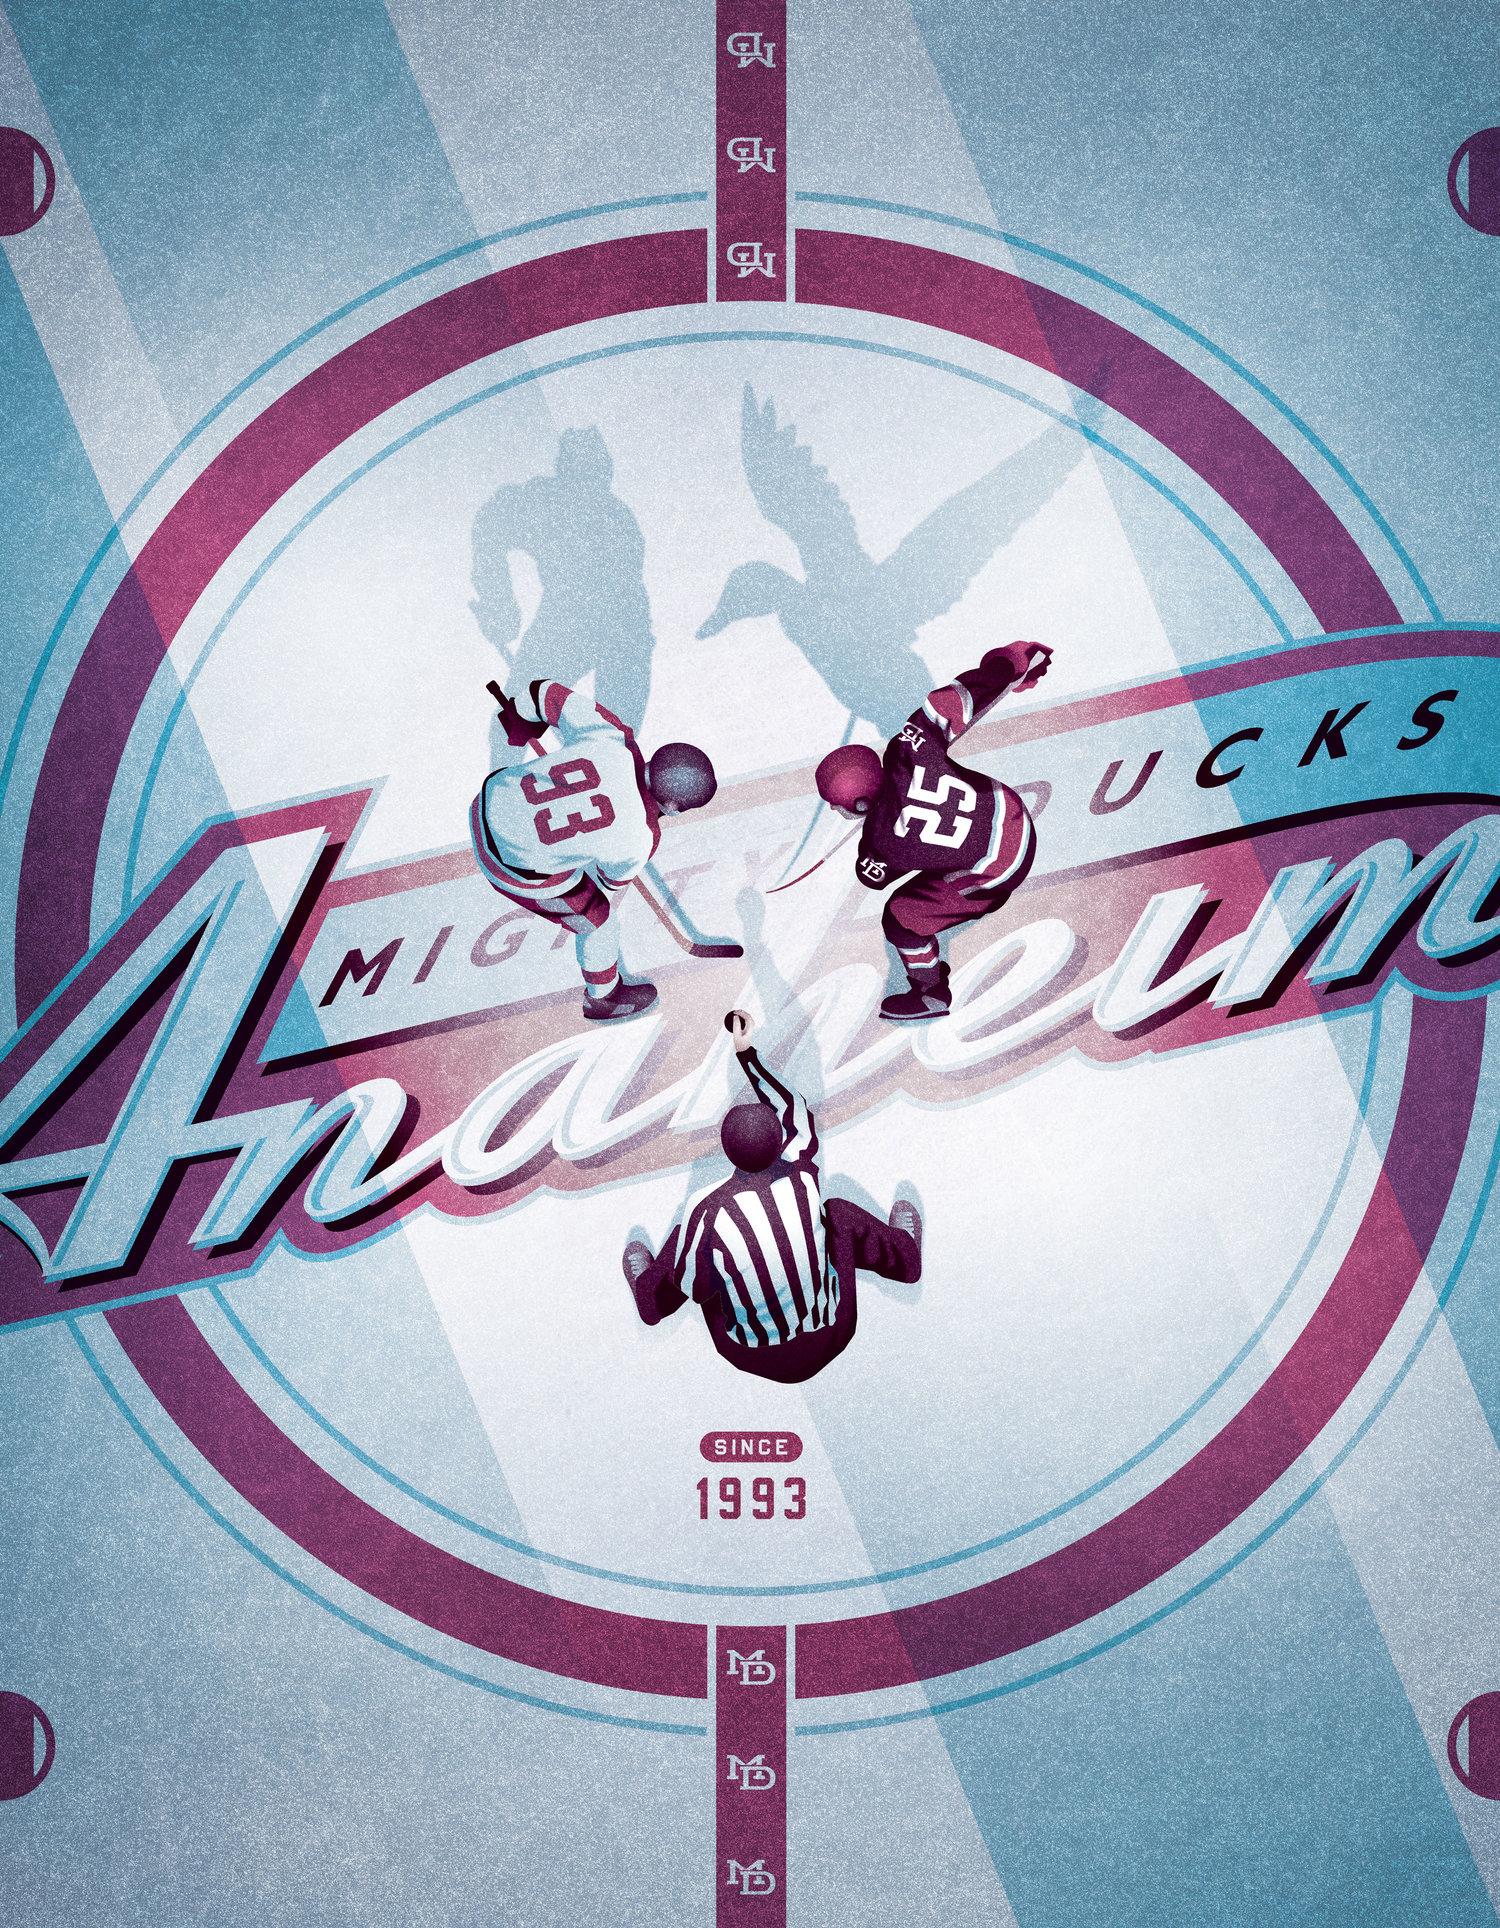 best website e200d 62e3f Mighty Ducks of Anaheim Anniversary Poster — DKNG